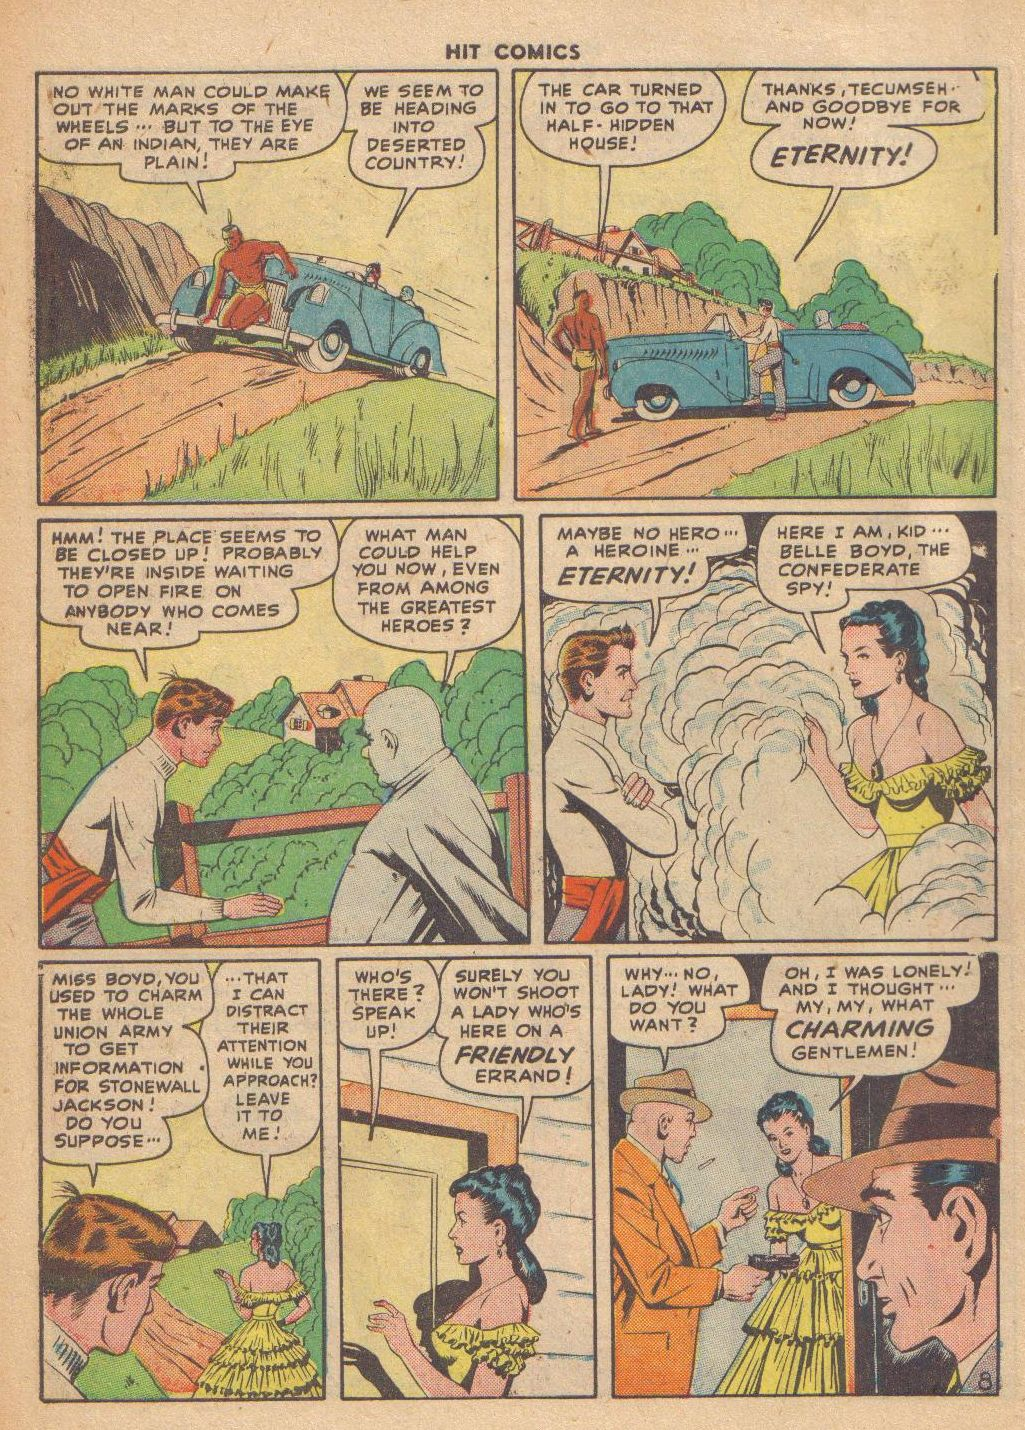 Read online Hit Comics comic -  Issue #46 - 10